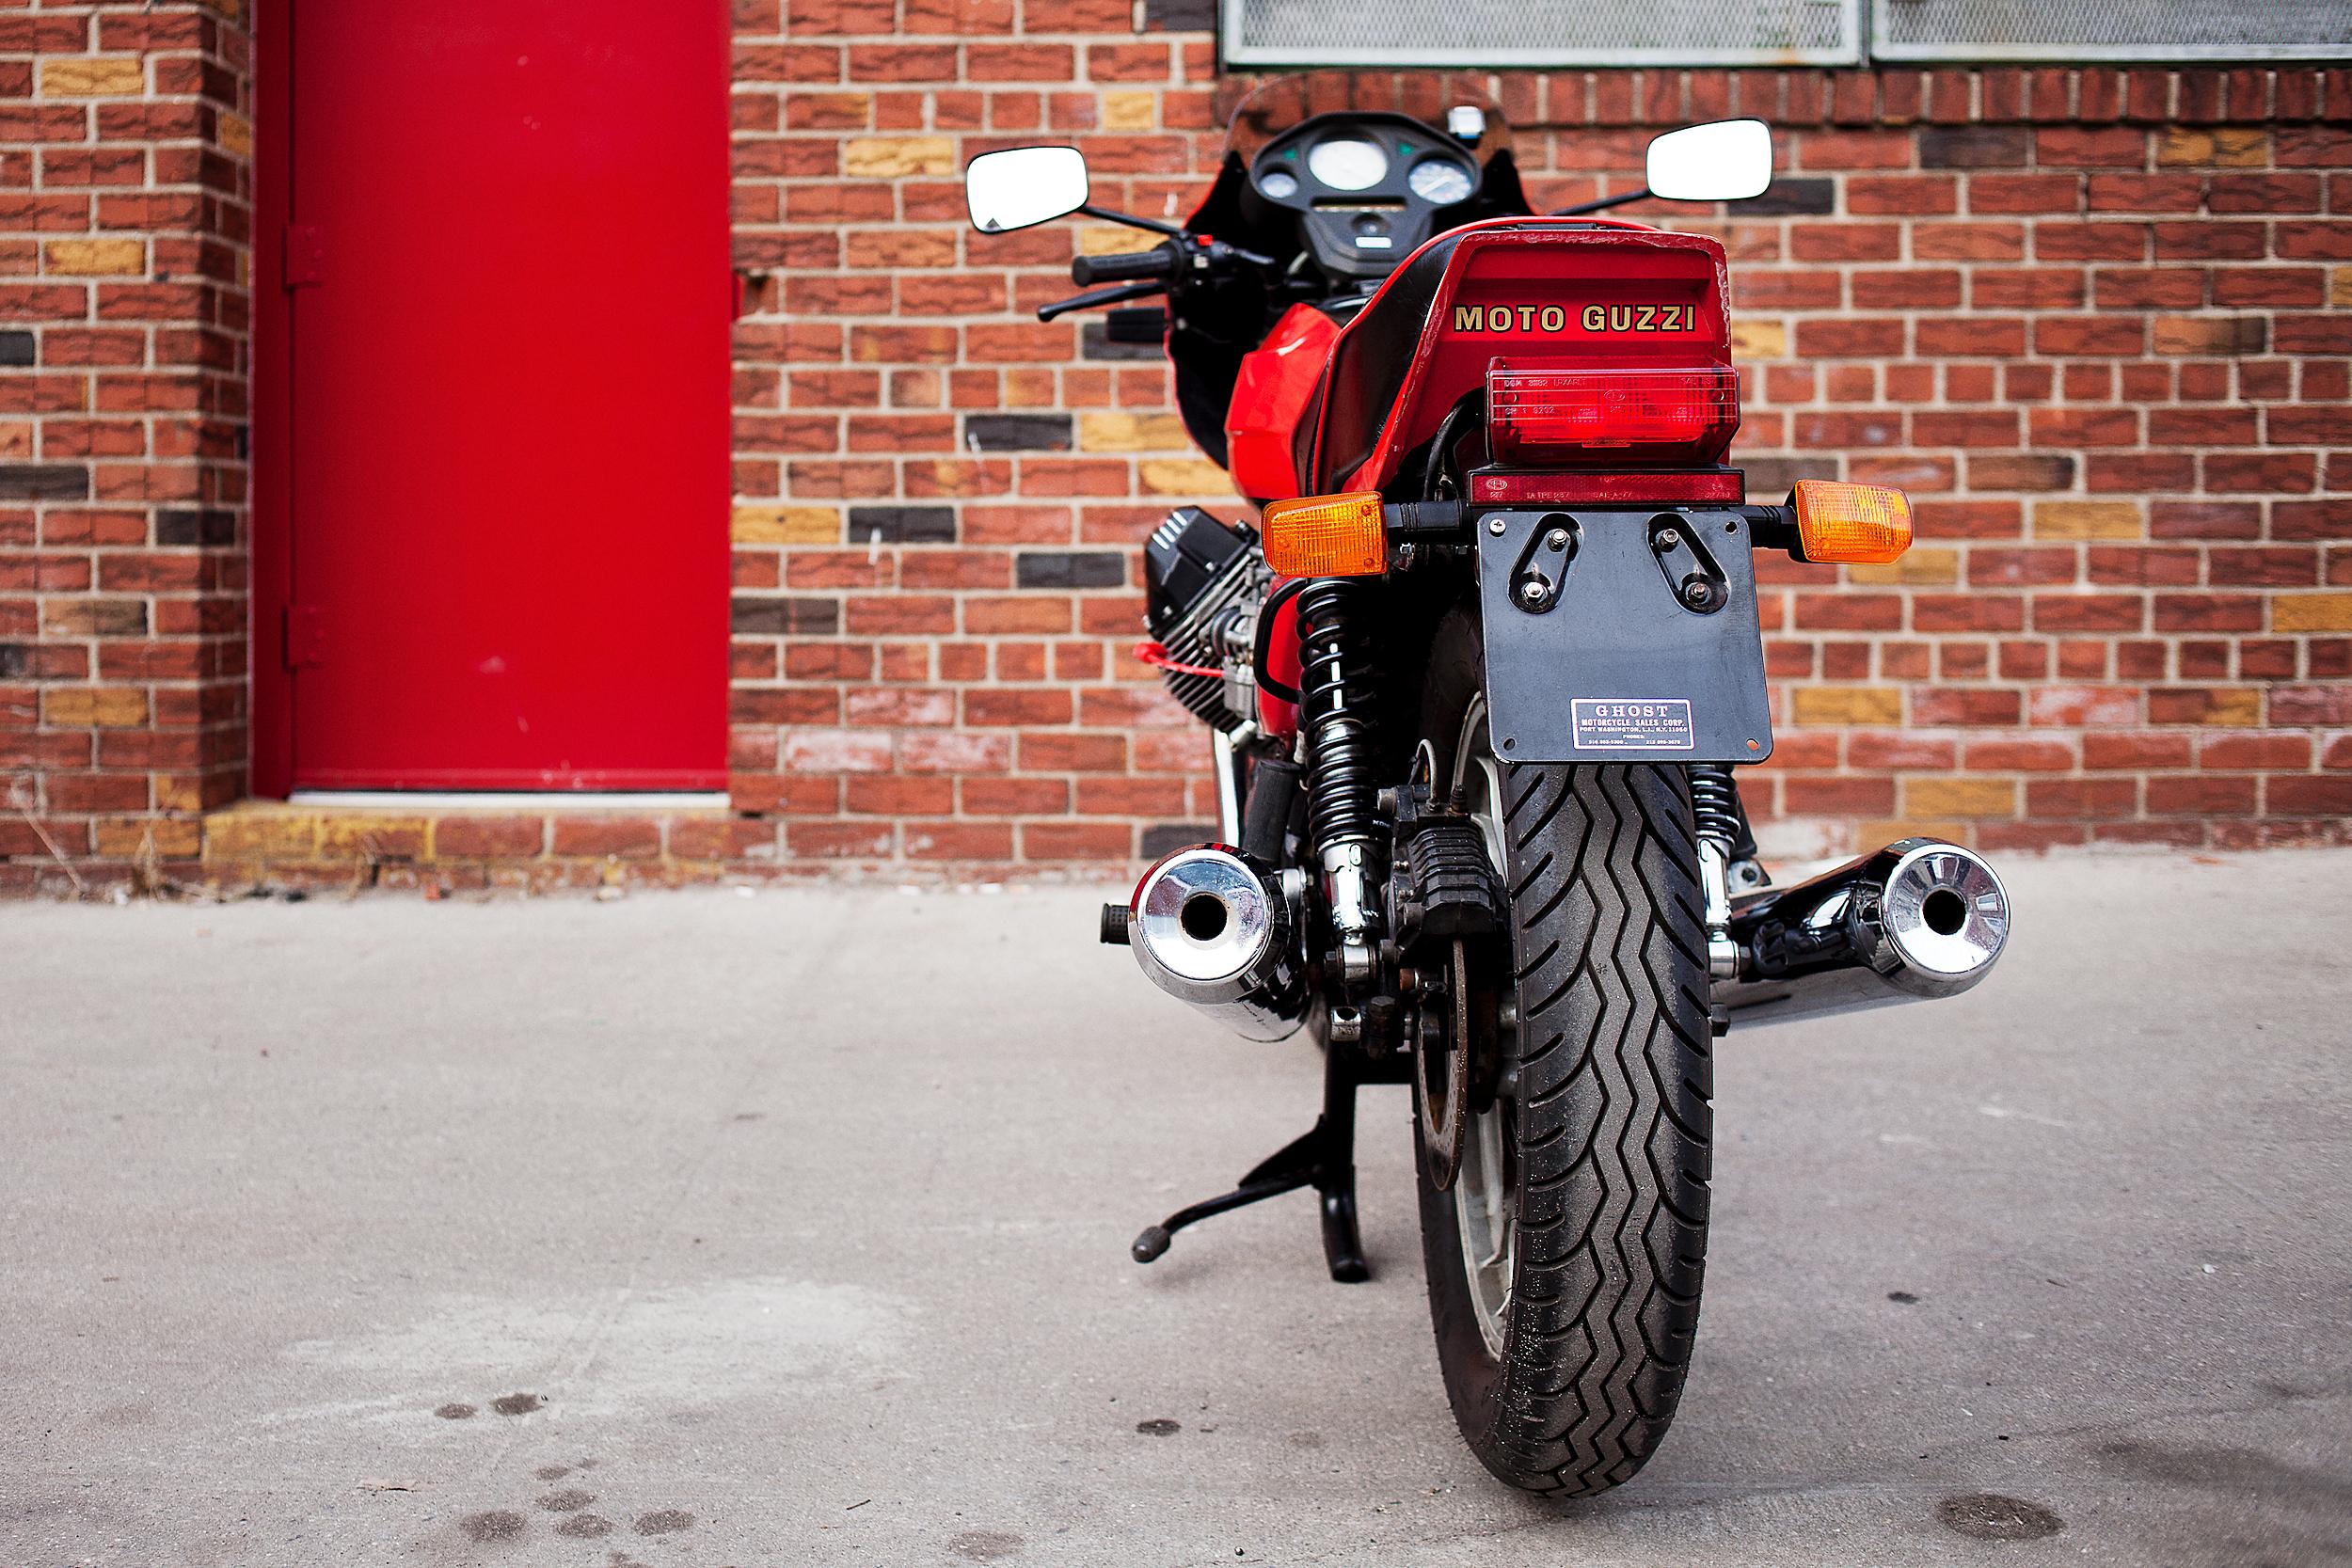 1983 Moto Guzzi Lemans 3 Tail